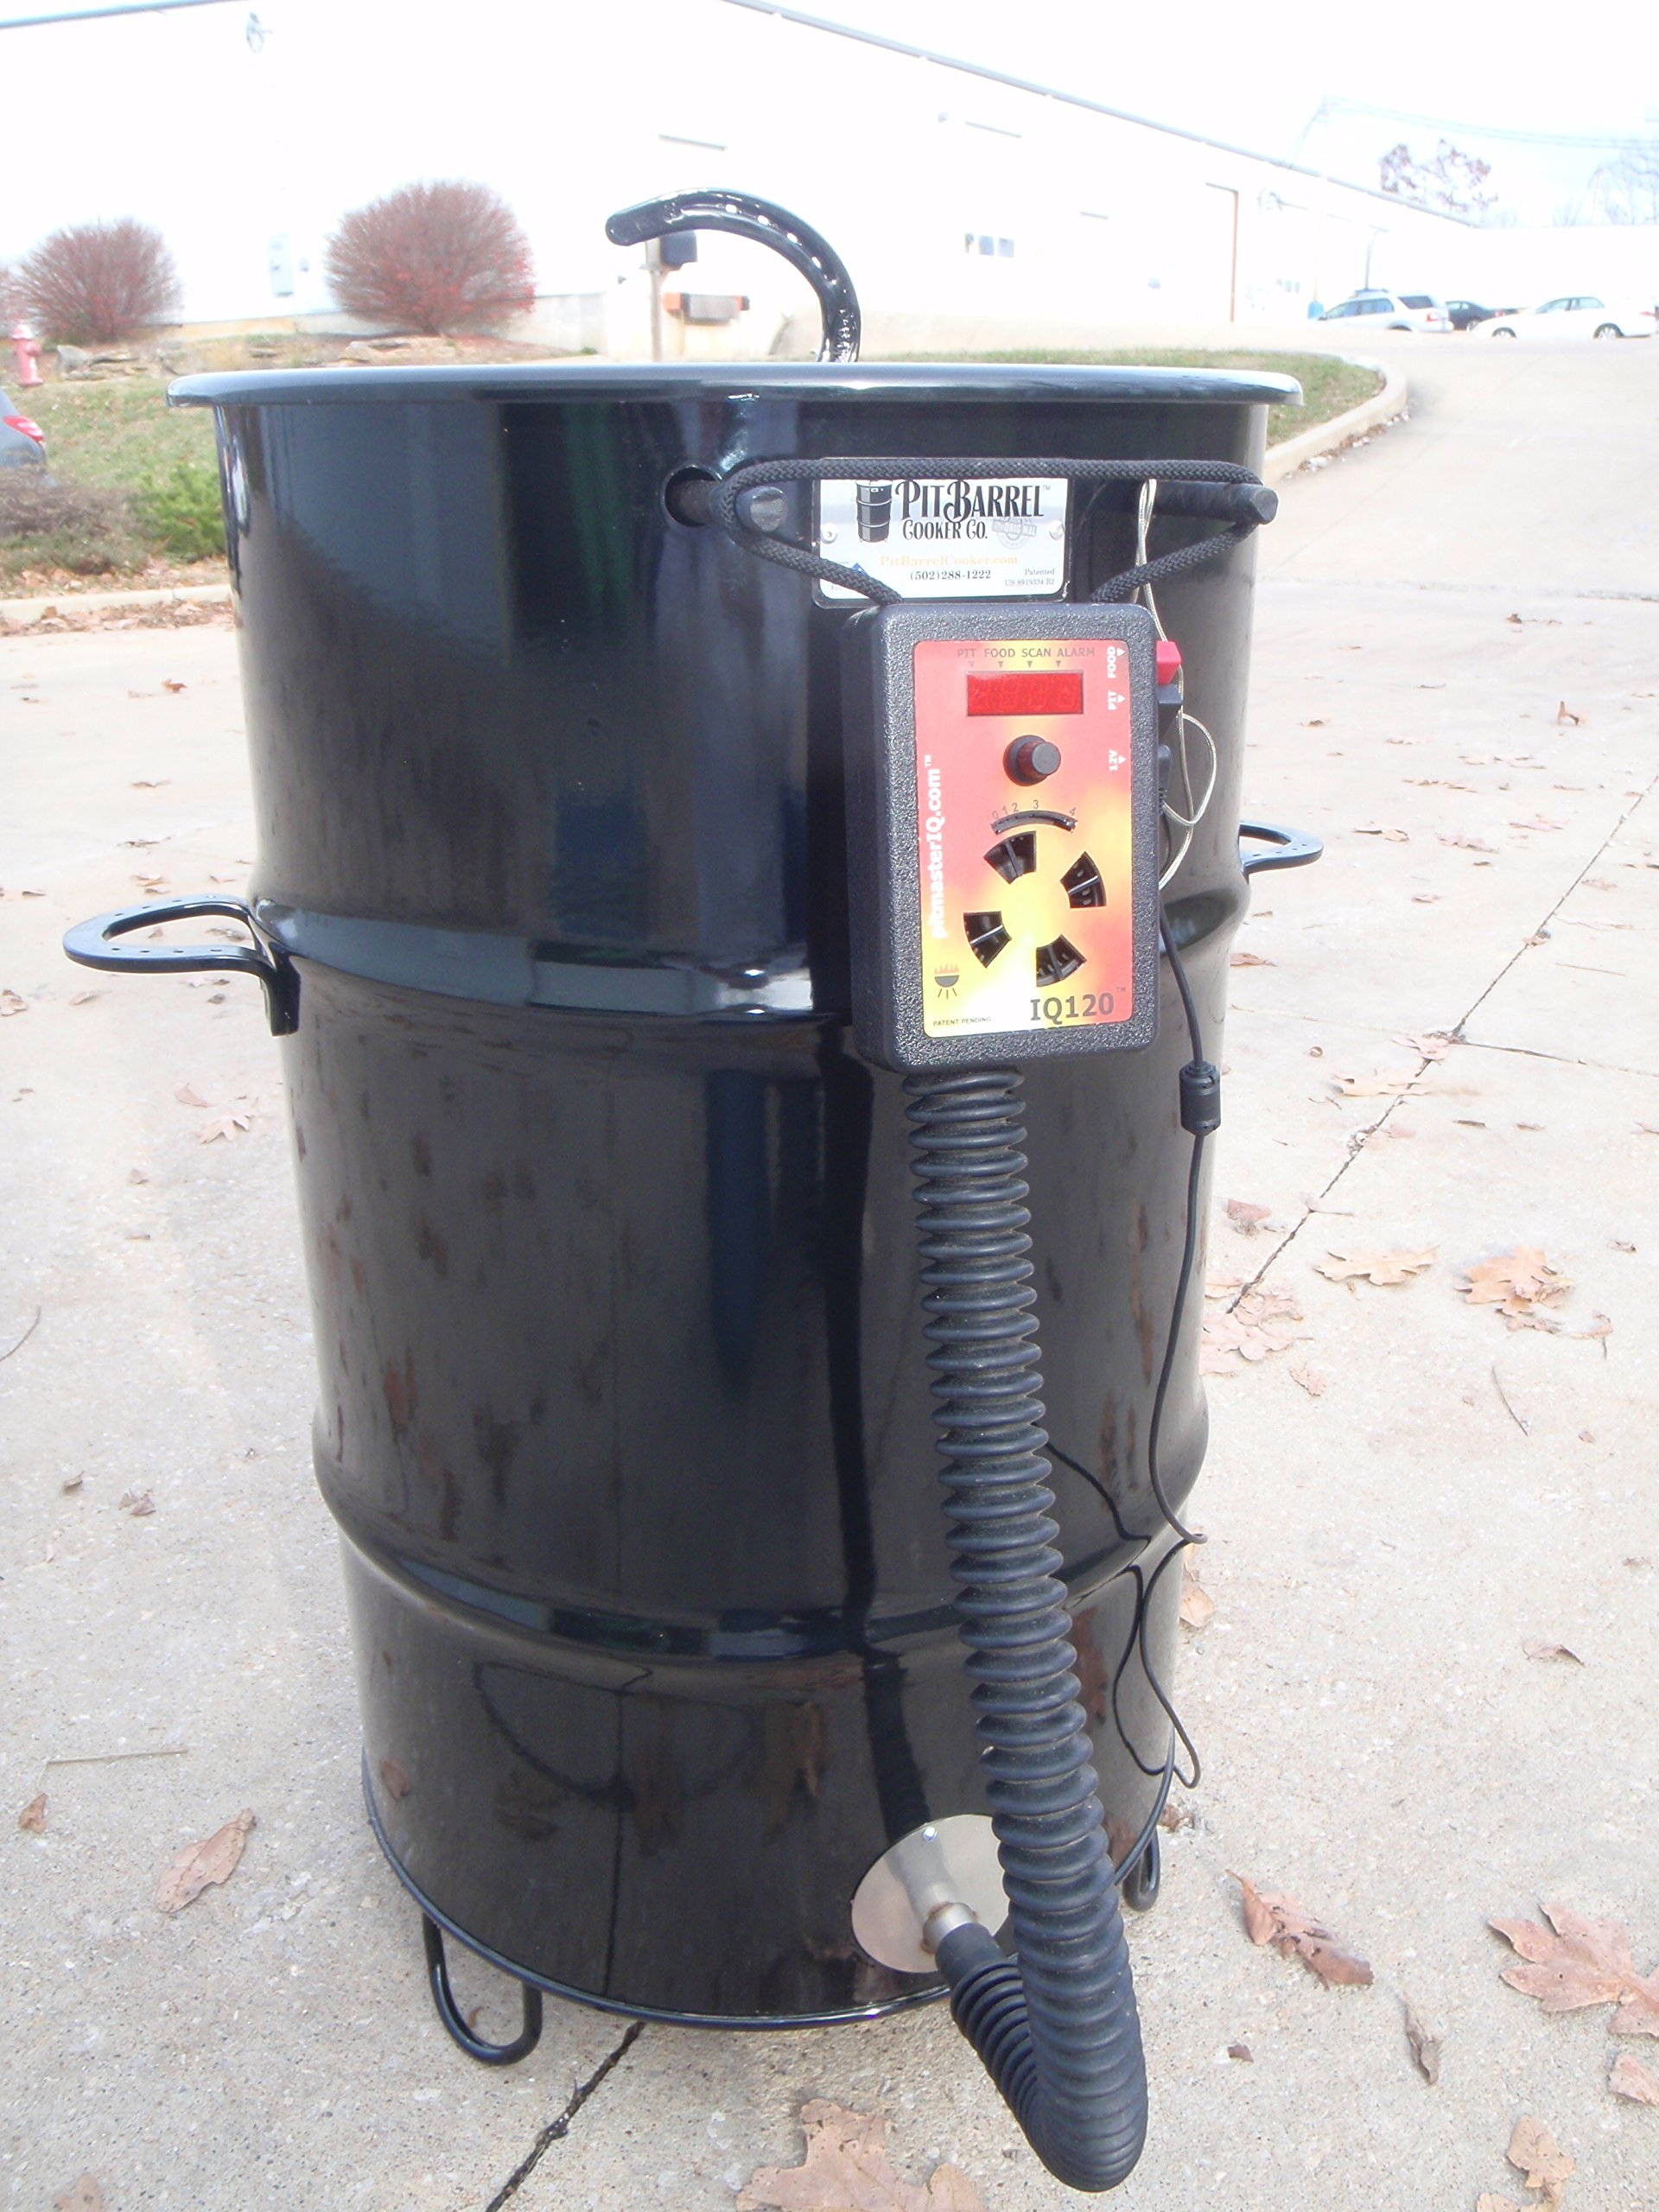 IQ120 BBQ Temperature Regulator Kit for Pit Barrel Cooker